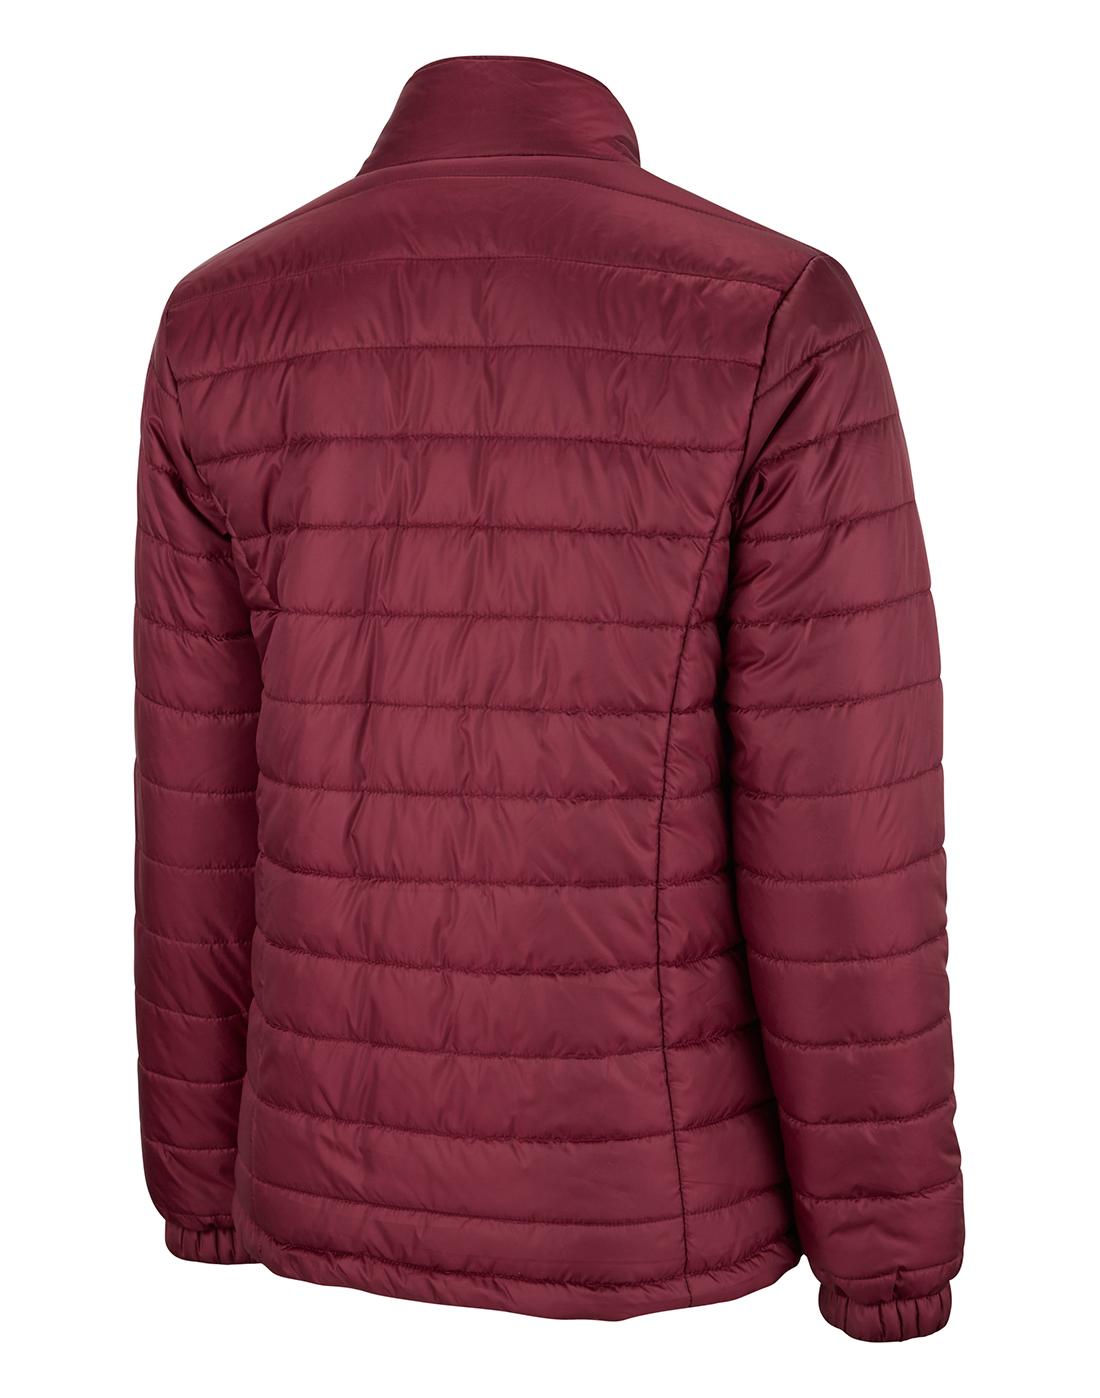 af1fea60b millie & gym Womens Yasmin Reversible Jacket